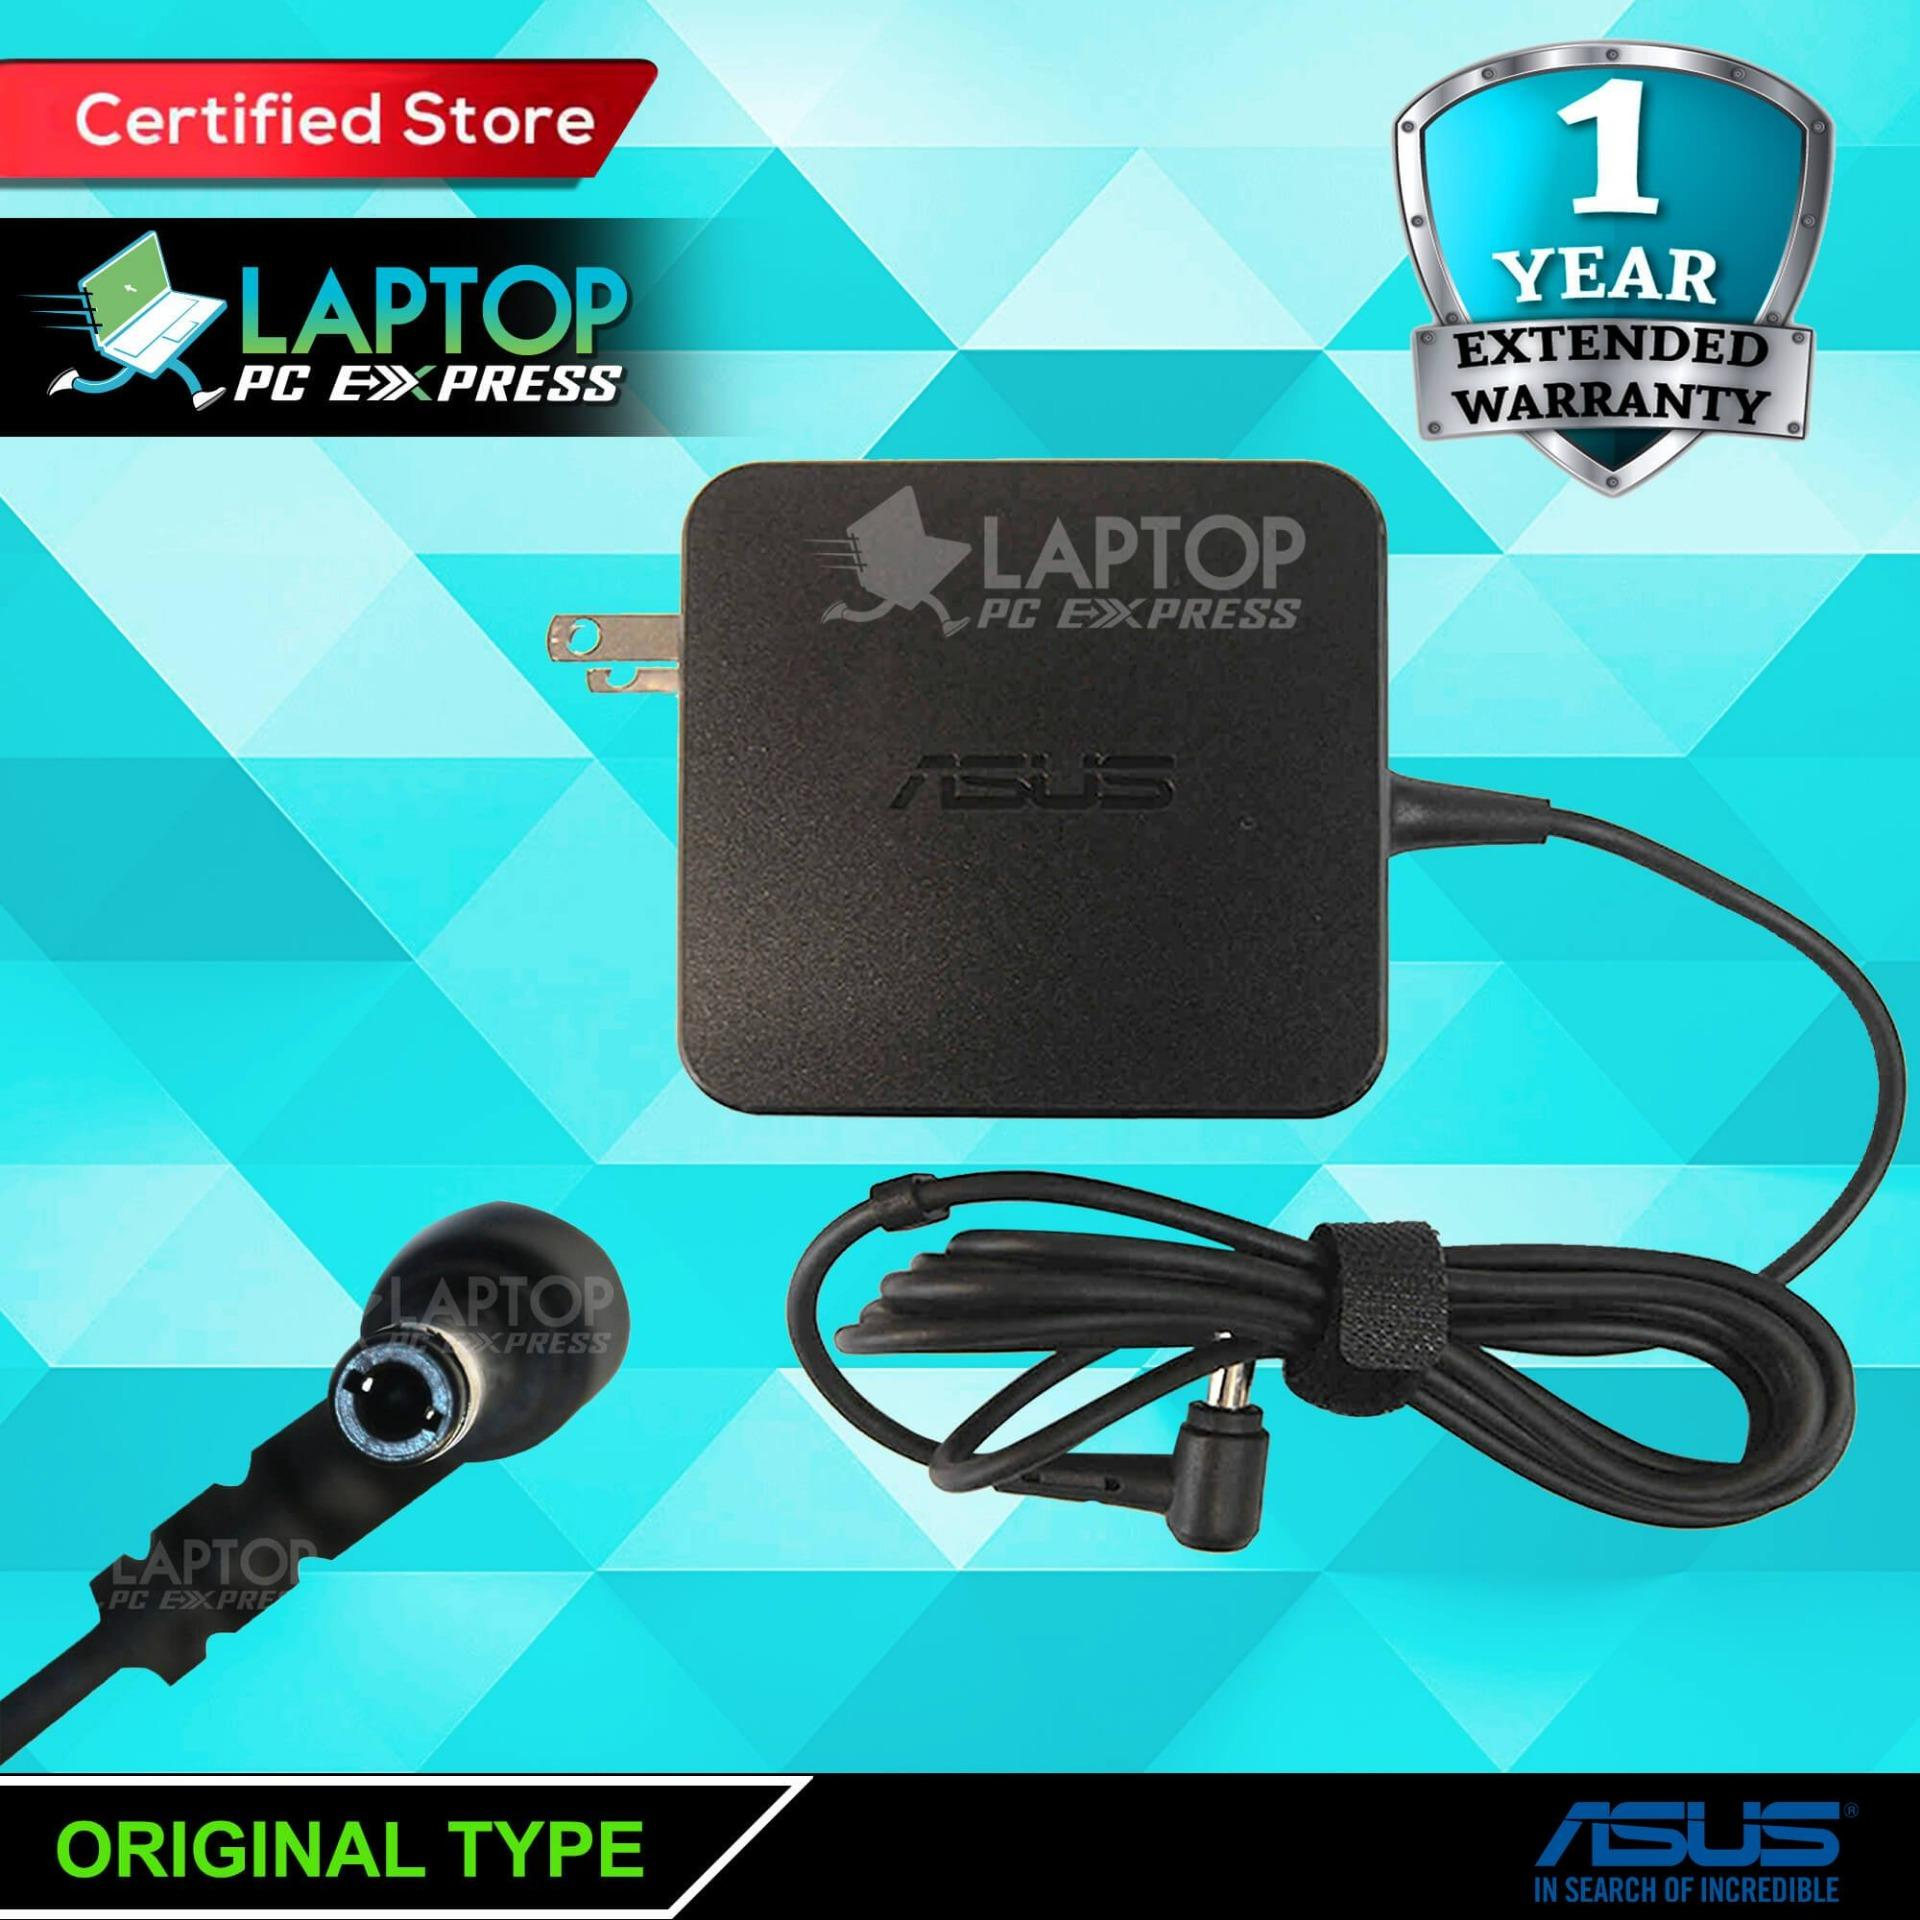 Asus Computer Accessories Philippines Pc For Sale Charger Desktop Lf Original Laptop 19v 342a X455l Vm510l X554l X555l X552 F455l